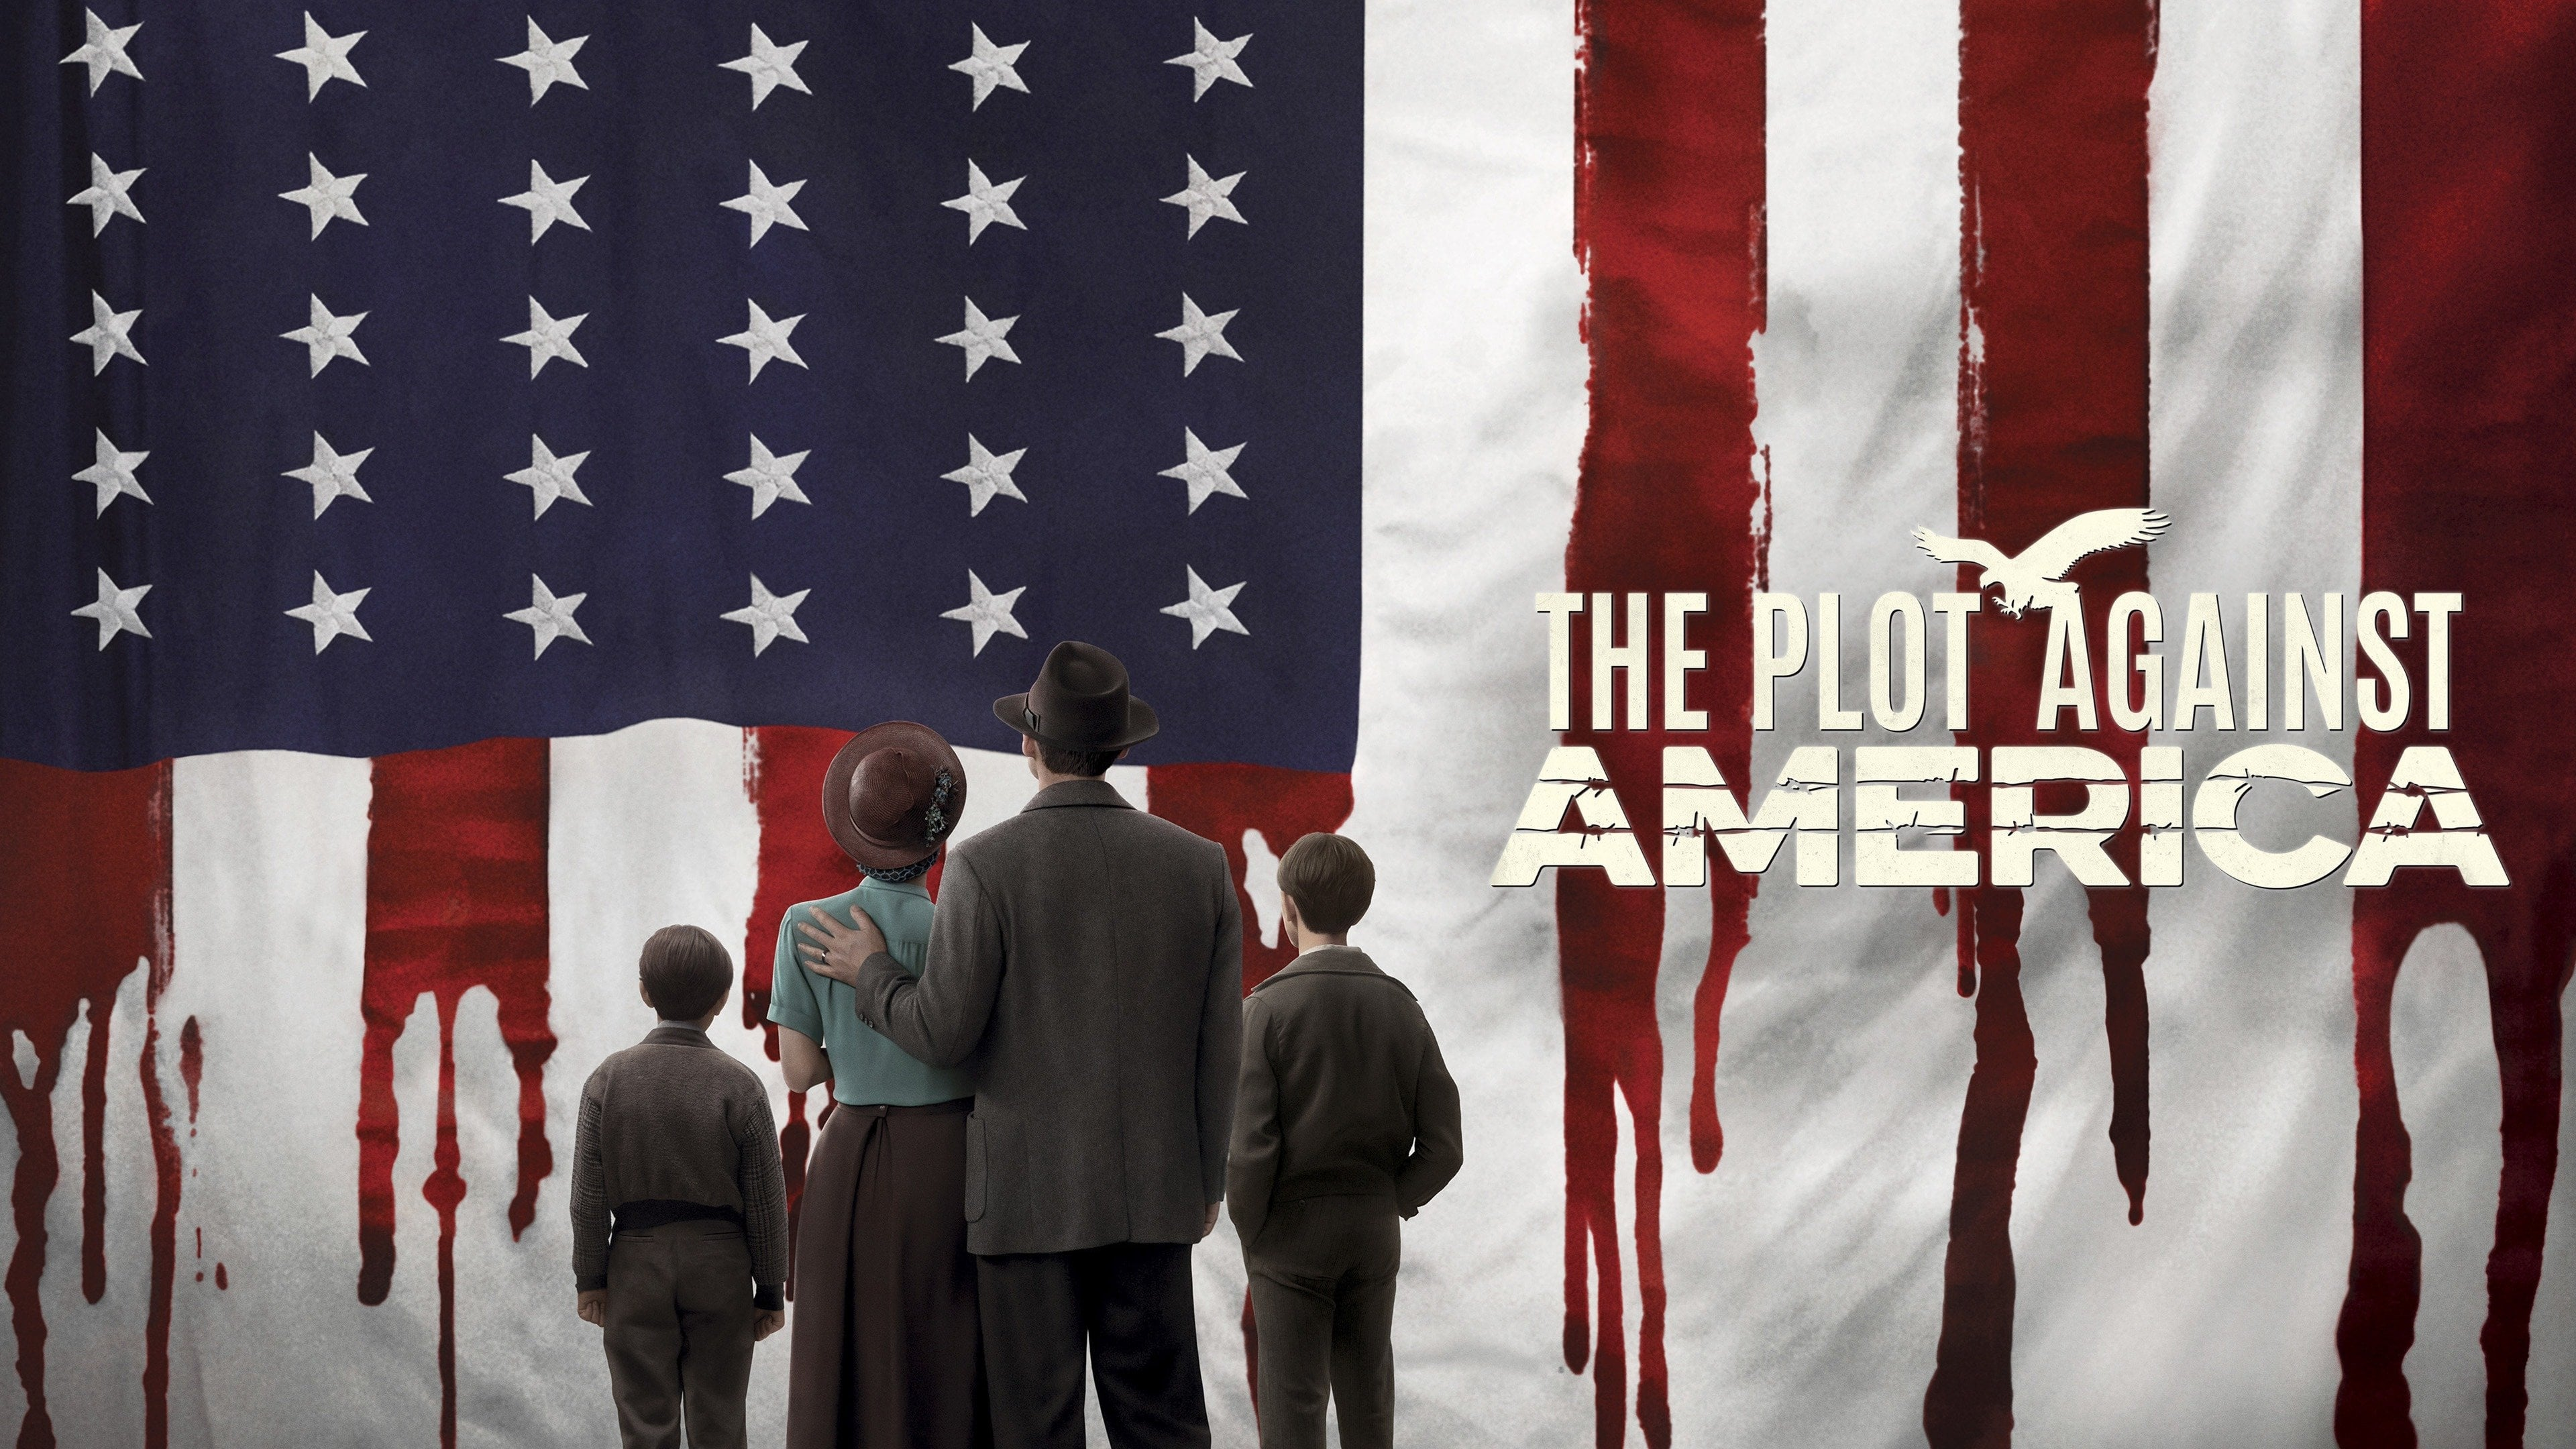 Maak kans op het eerste seizoen van The Plot Against America